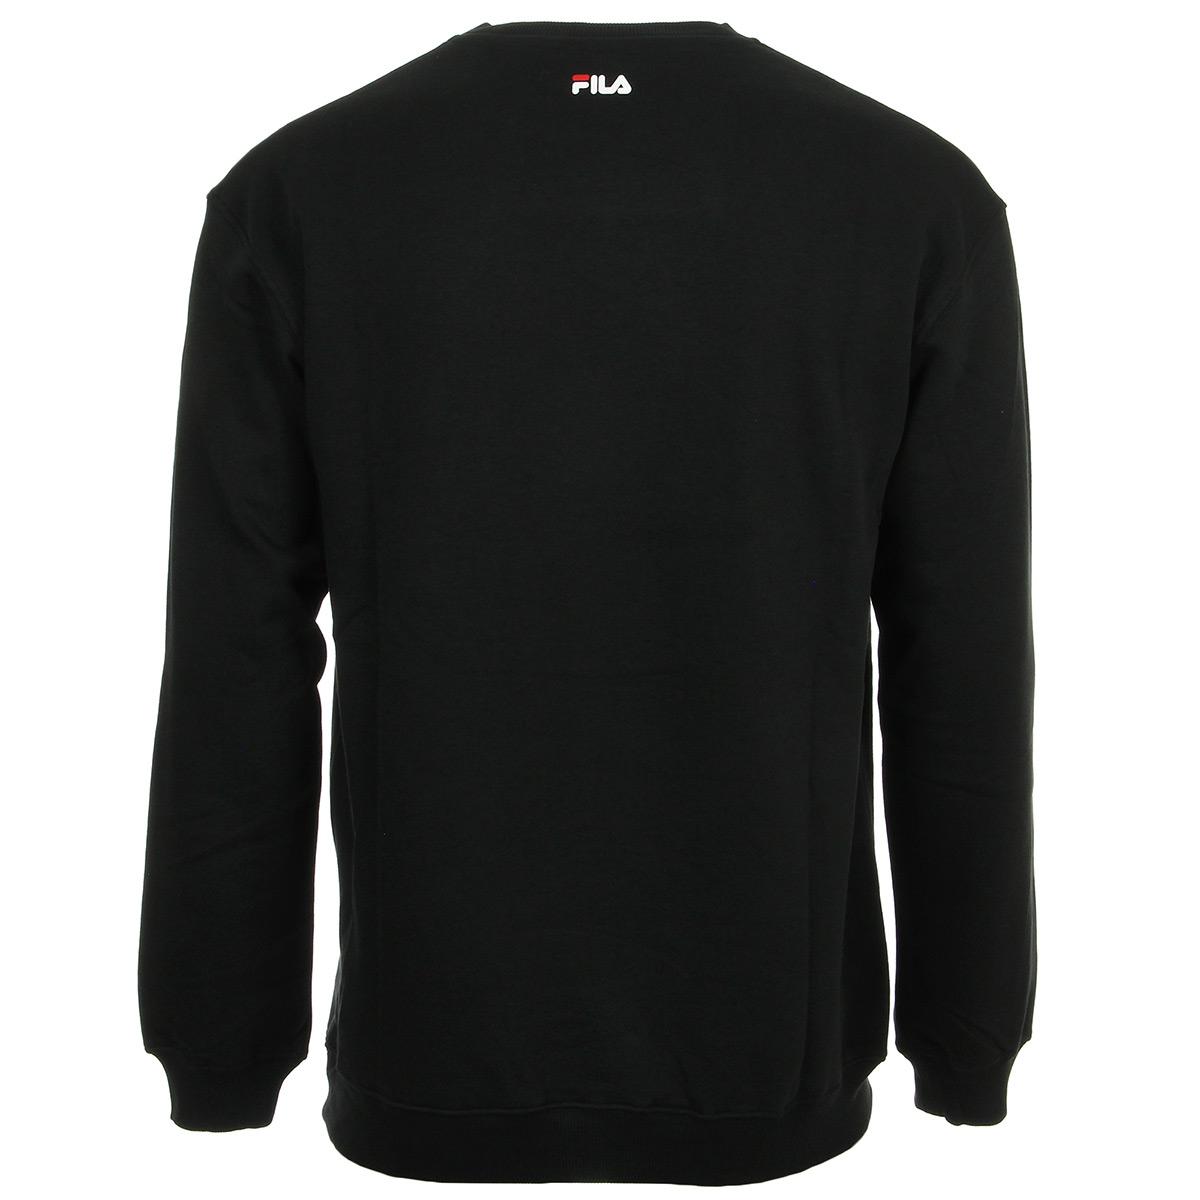 Fila Classic Logo Sweater 680431002, Sweats